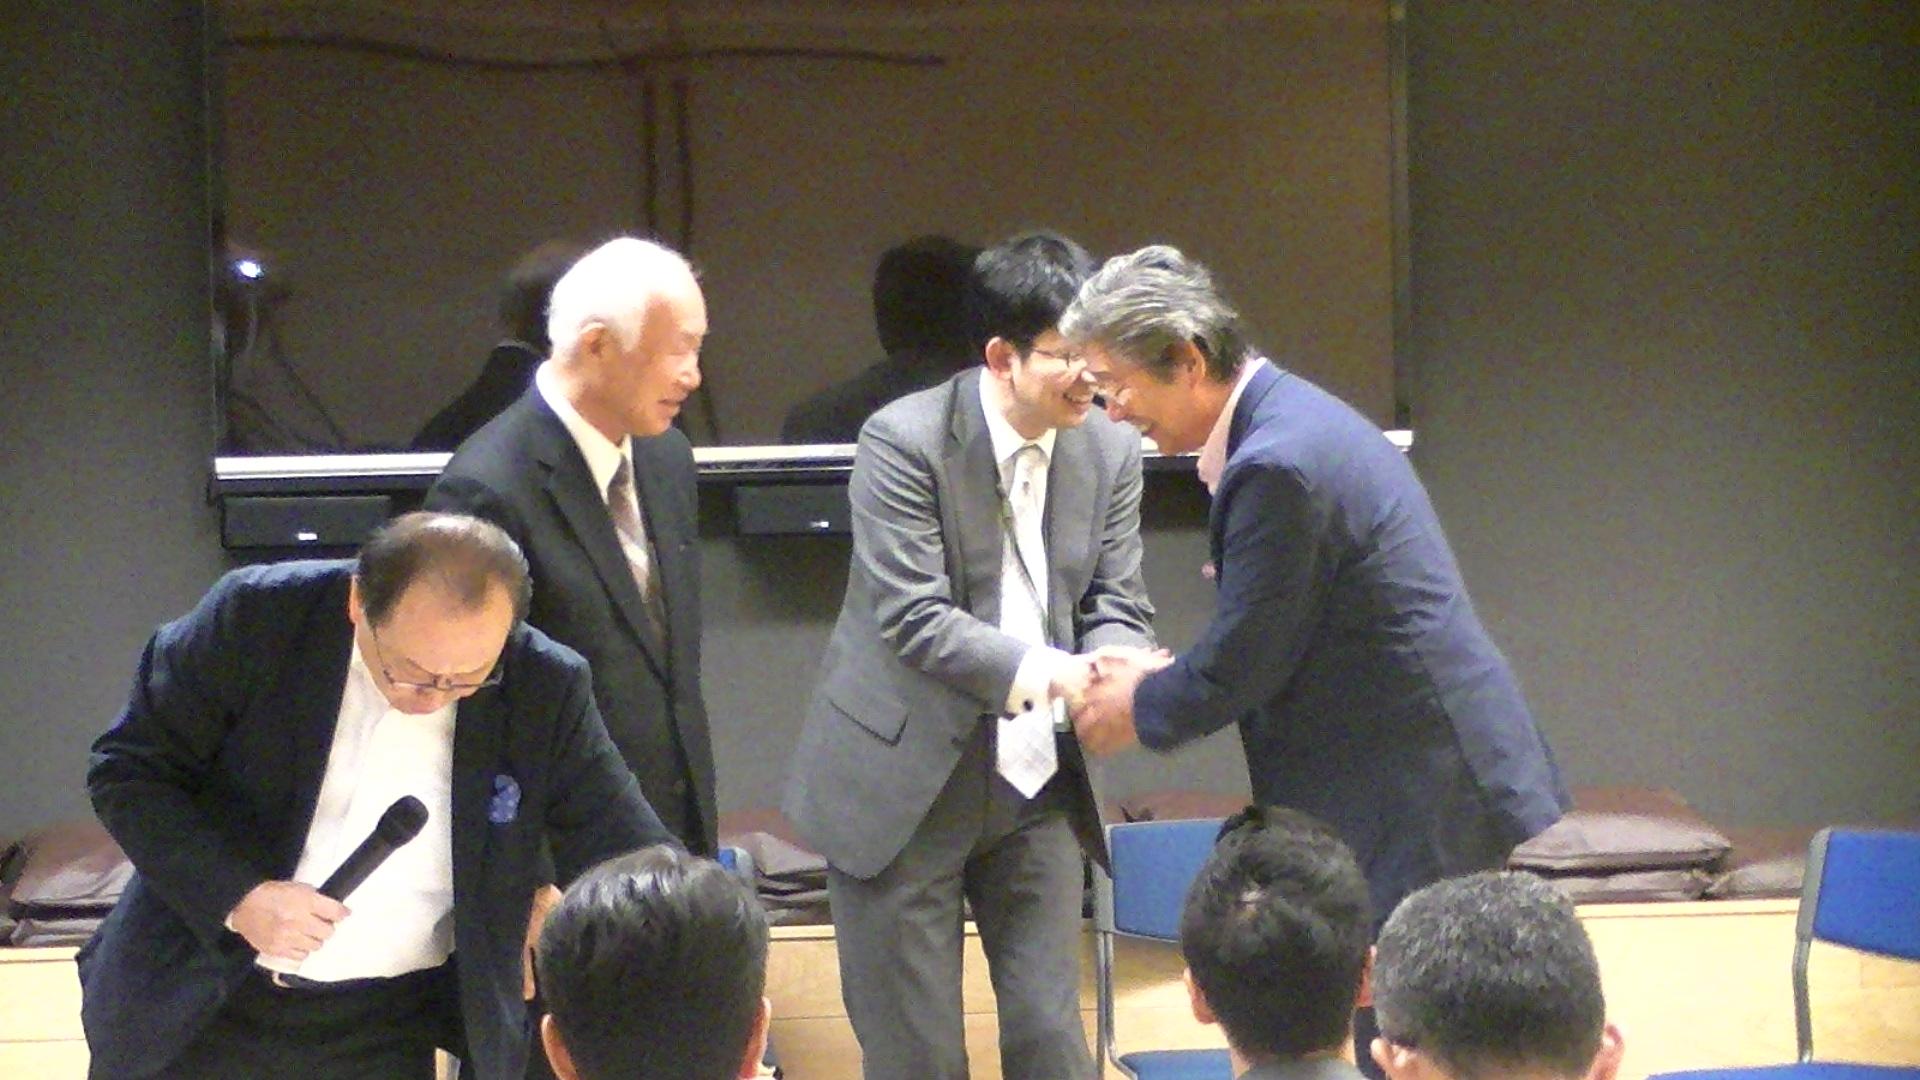 PIC 0049 - 4月1日東京思風塾の開催になります。